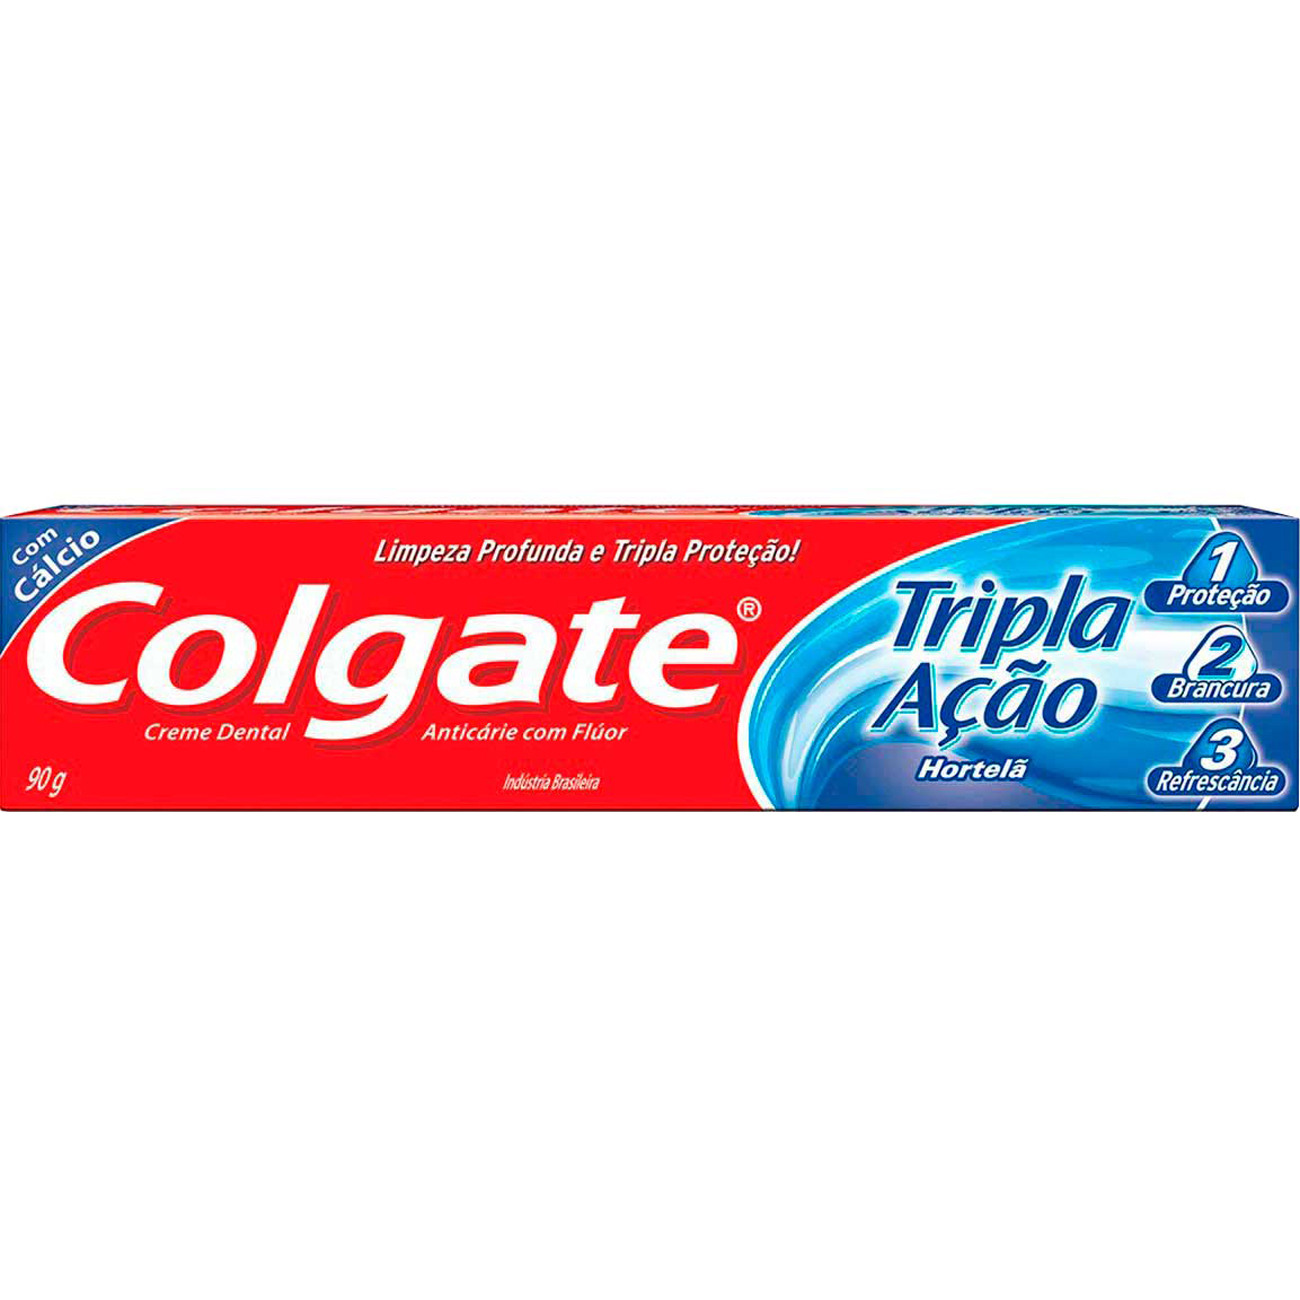 Creme Dental Colgate Tripla Acao Hortela 90G